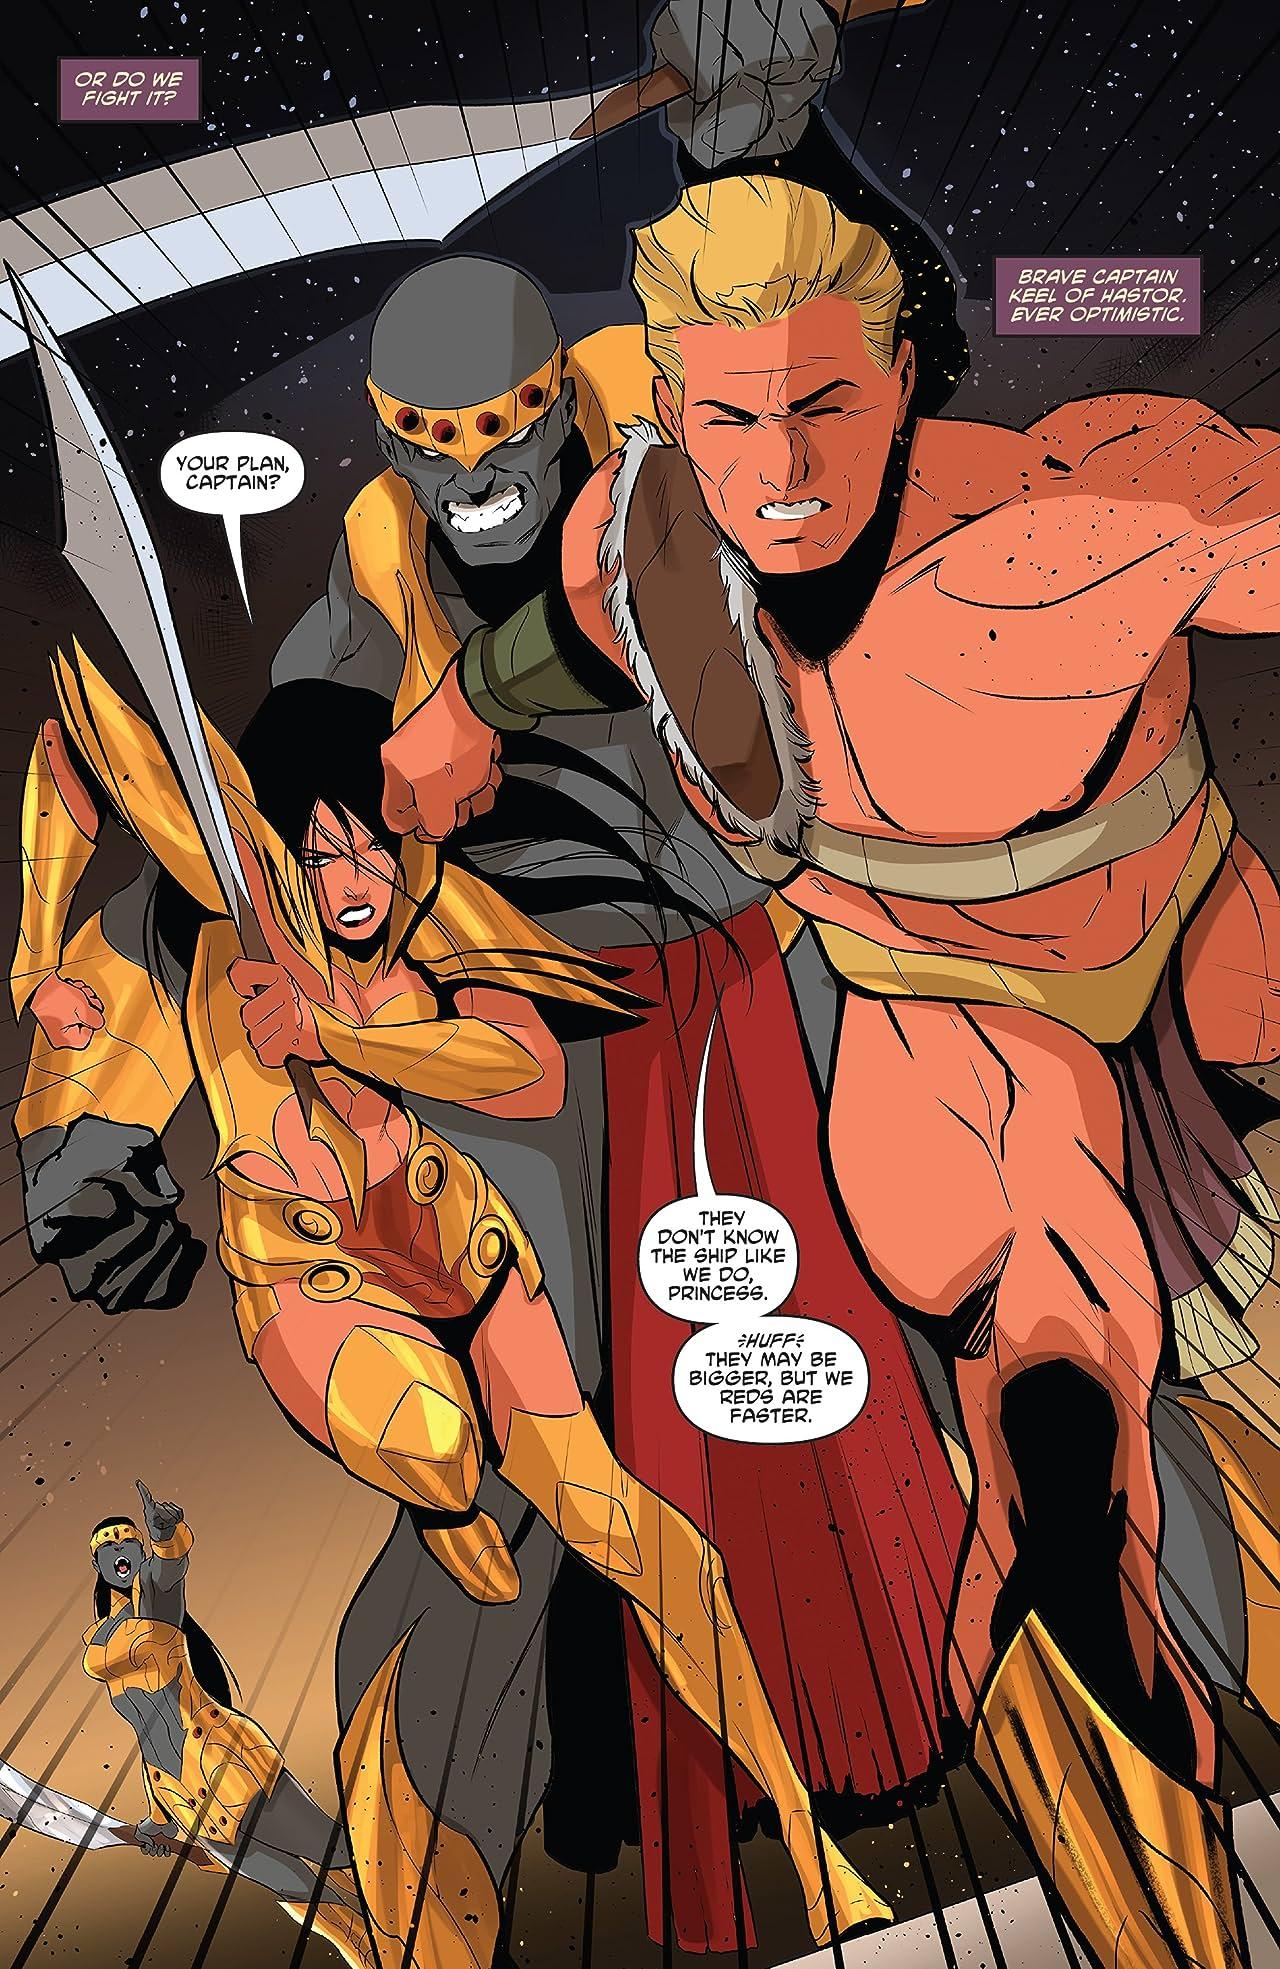 Dejah Thoris Vol. 4 #9